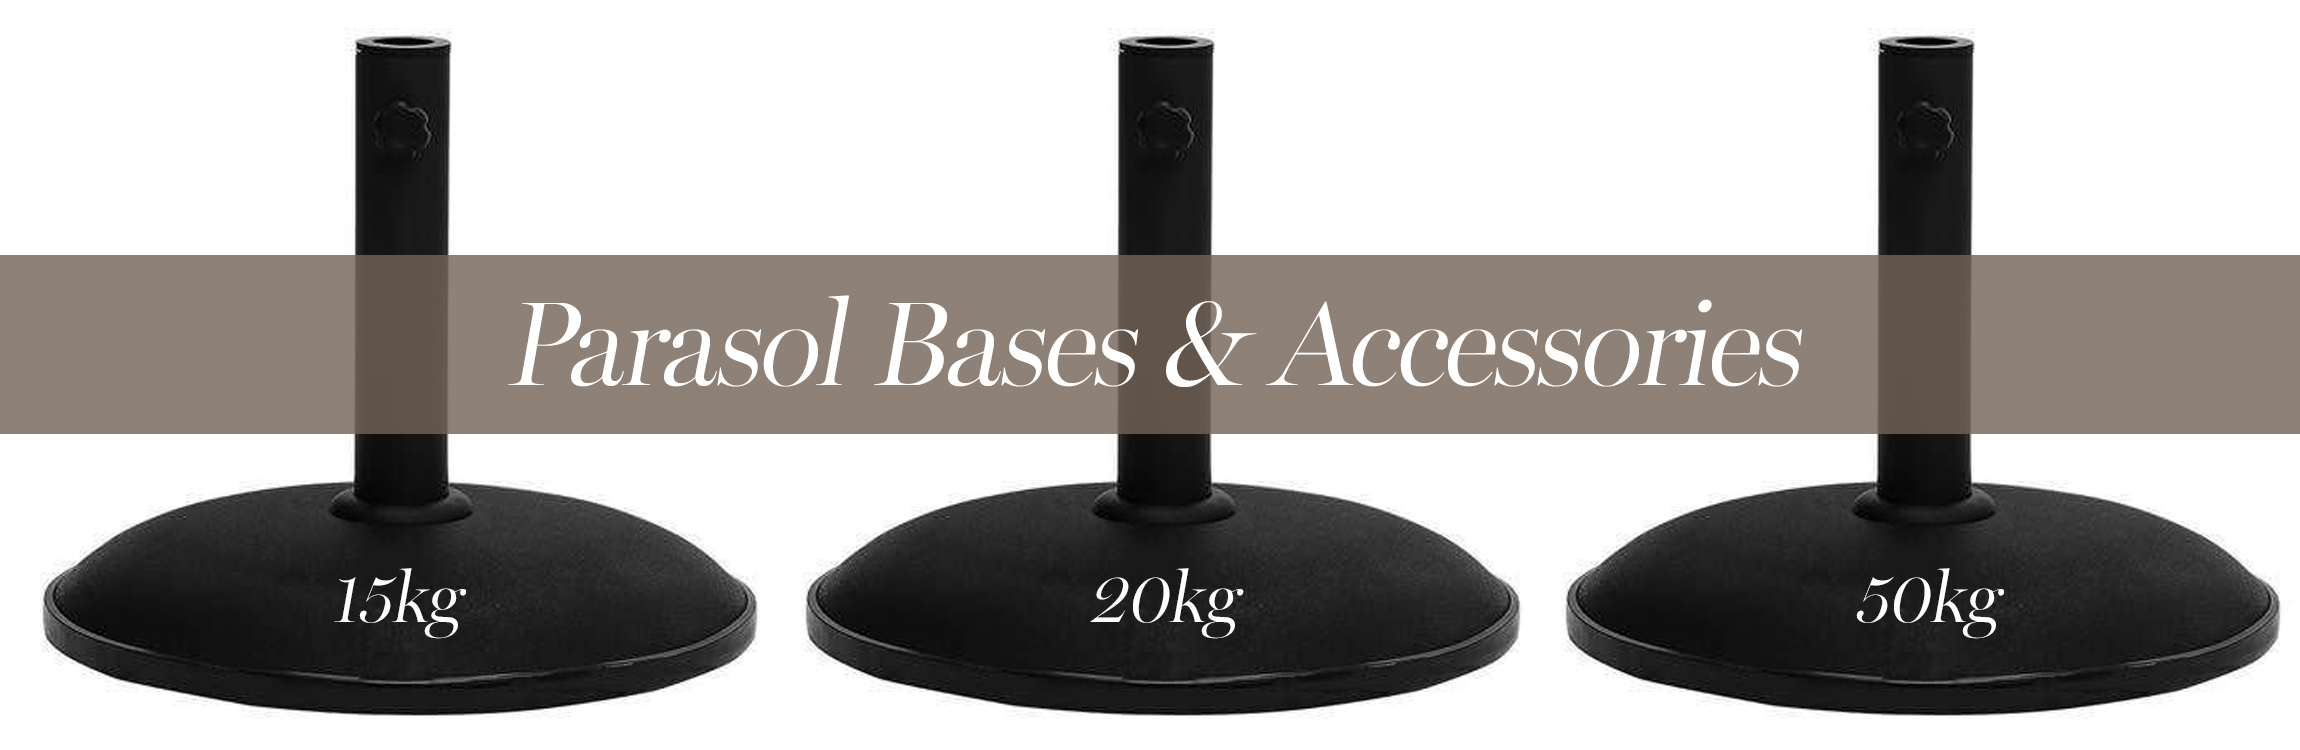 Parasol Bases